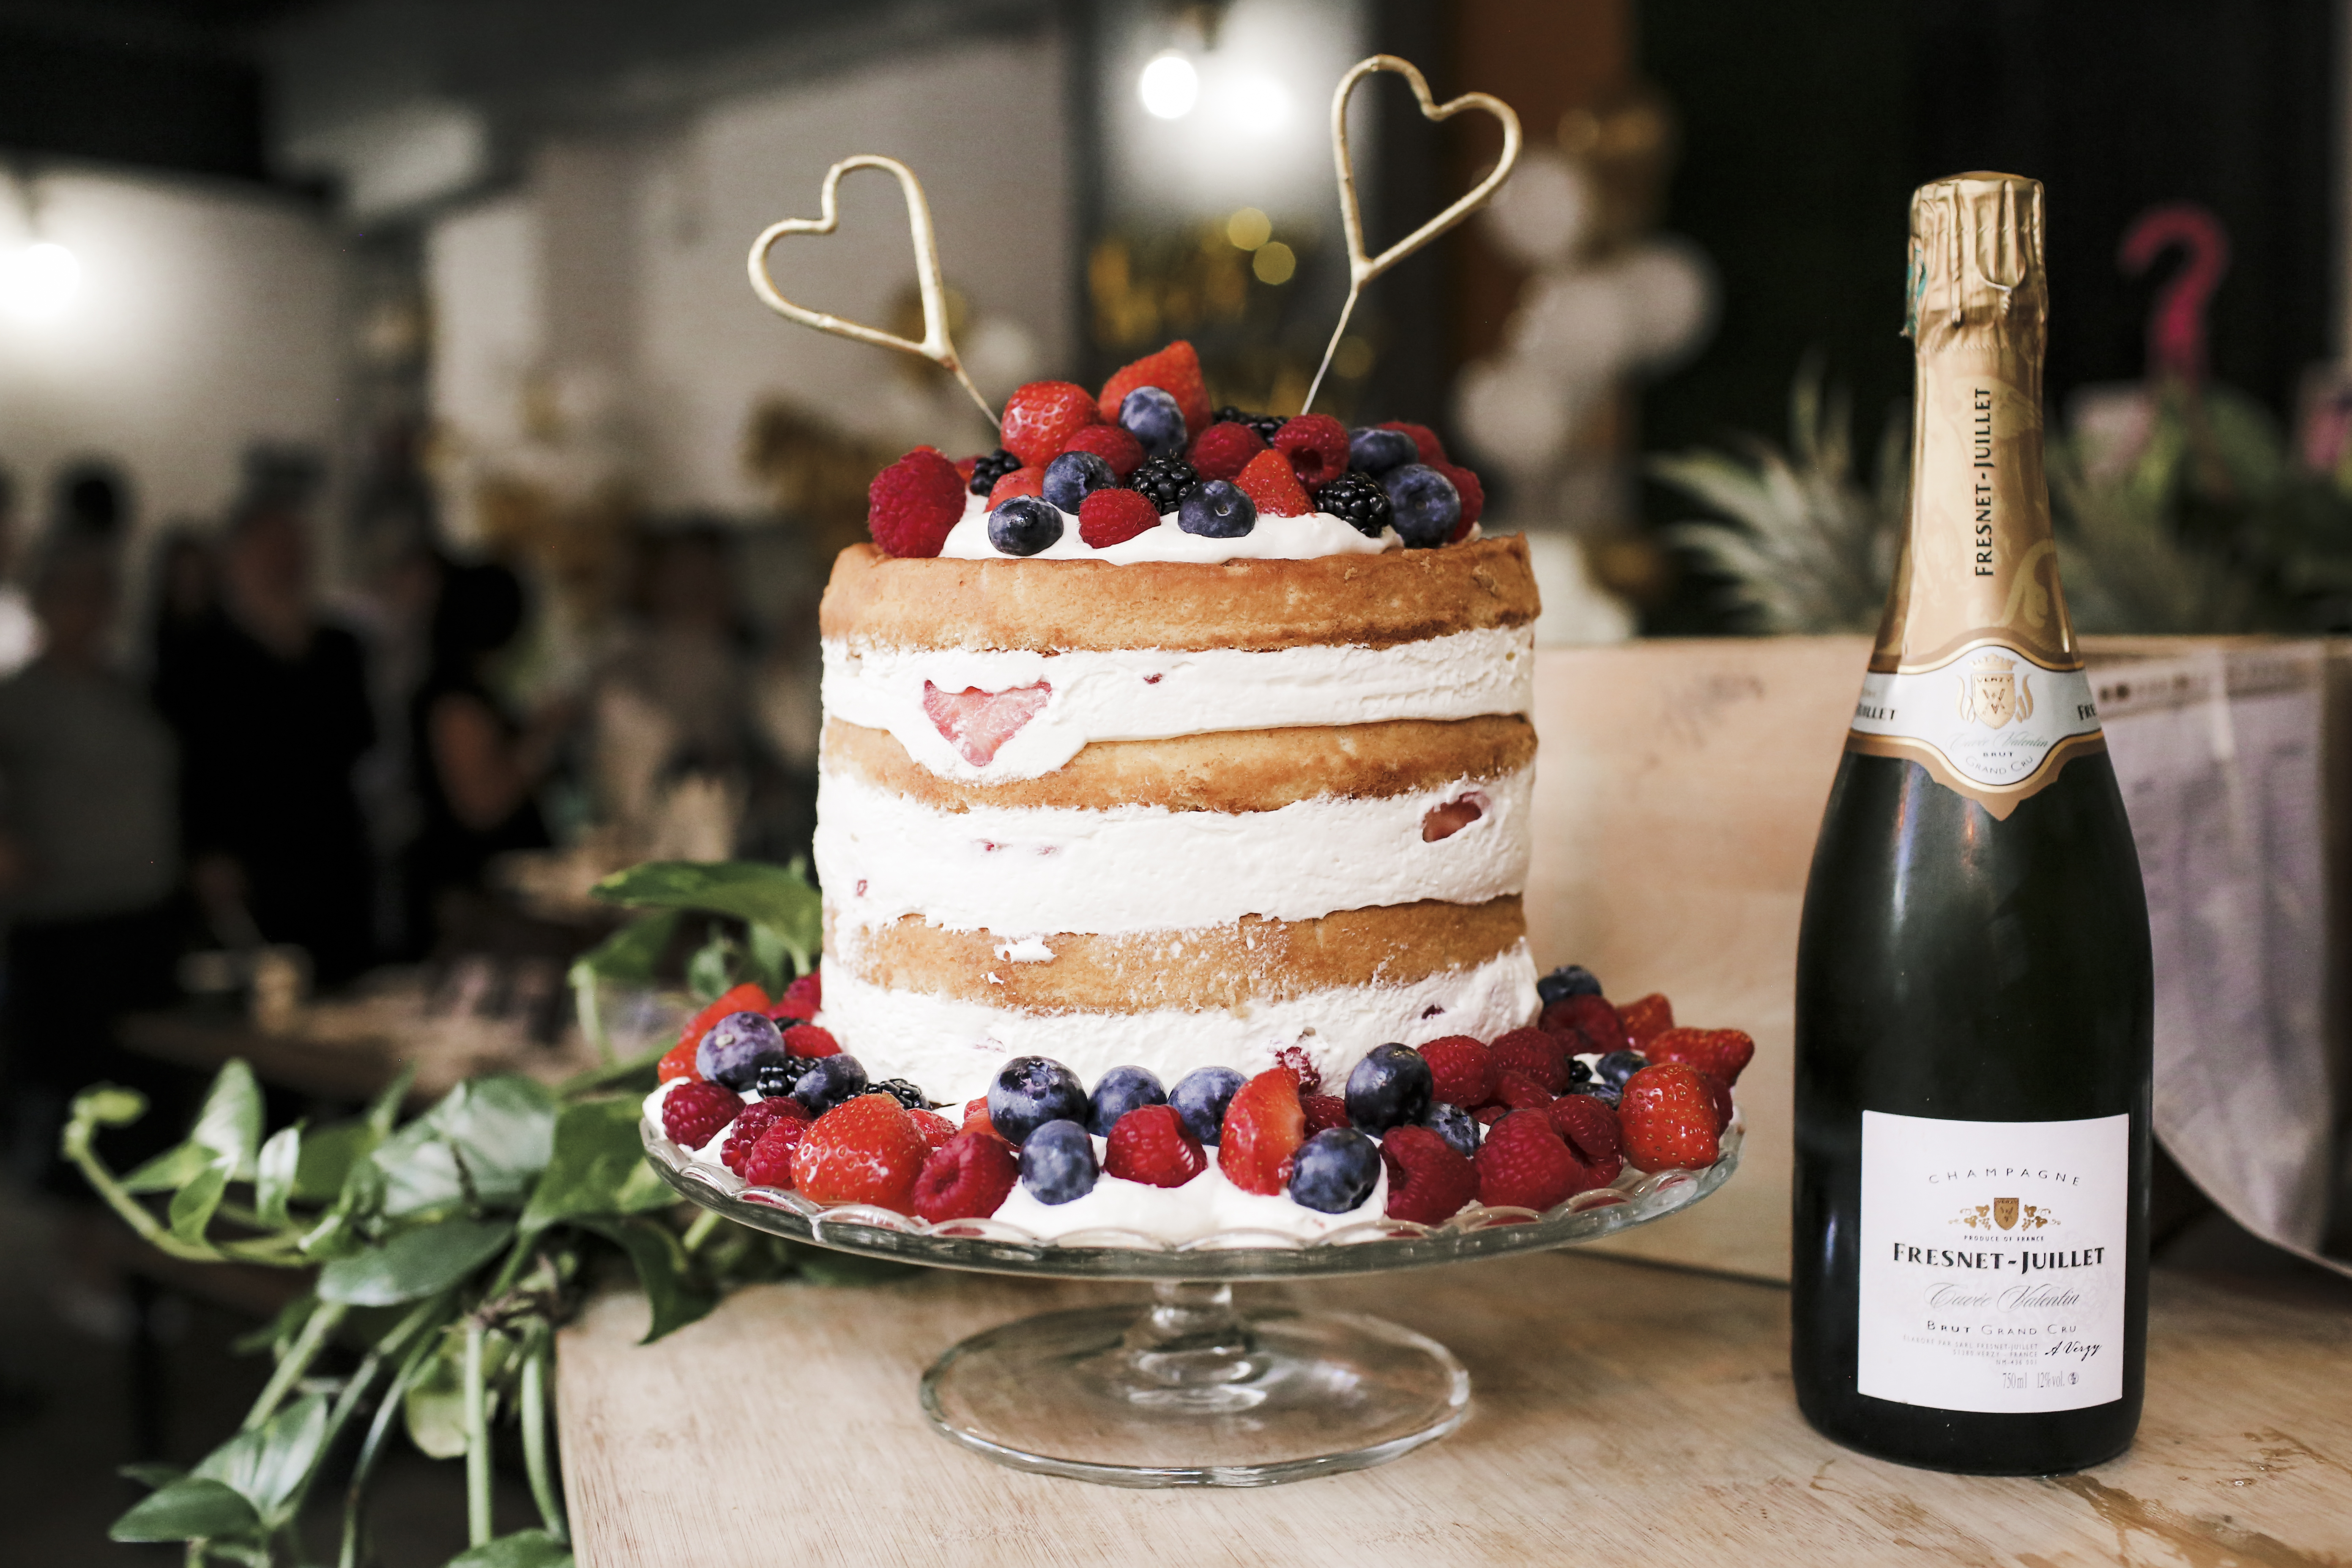 Recette du naked cake aux fruits rouges